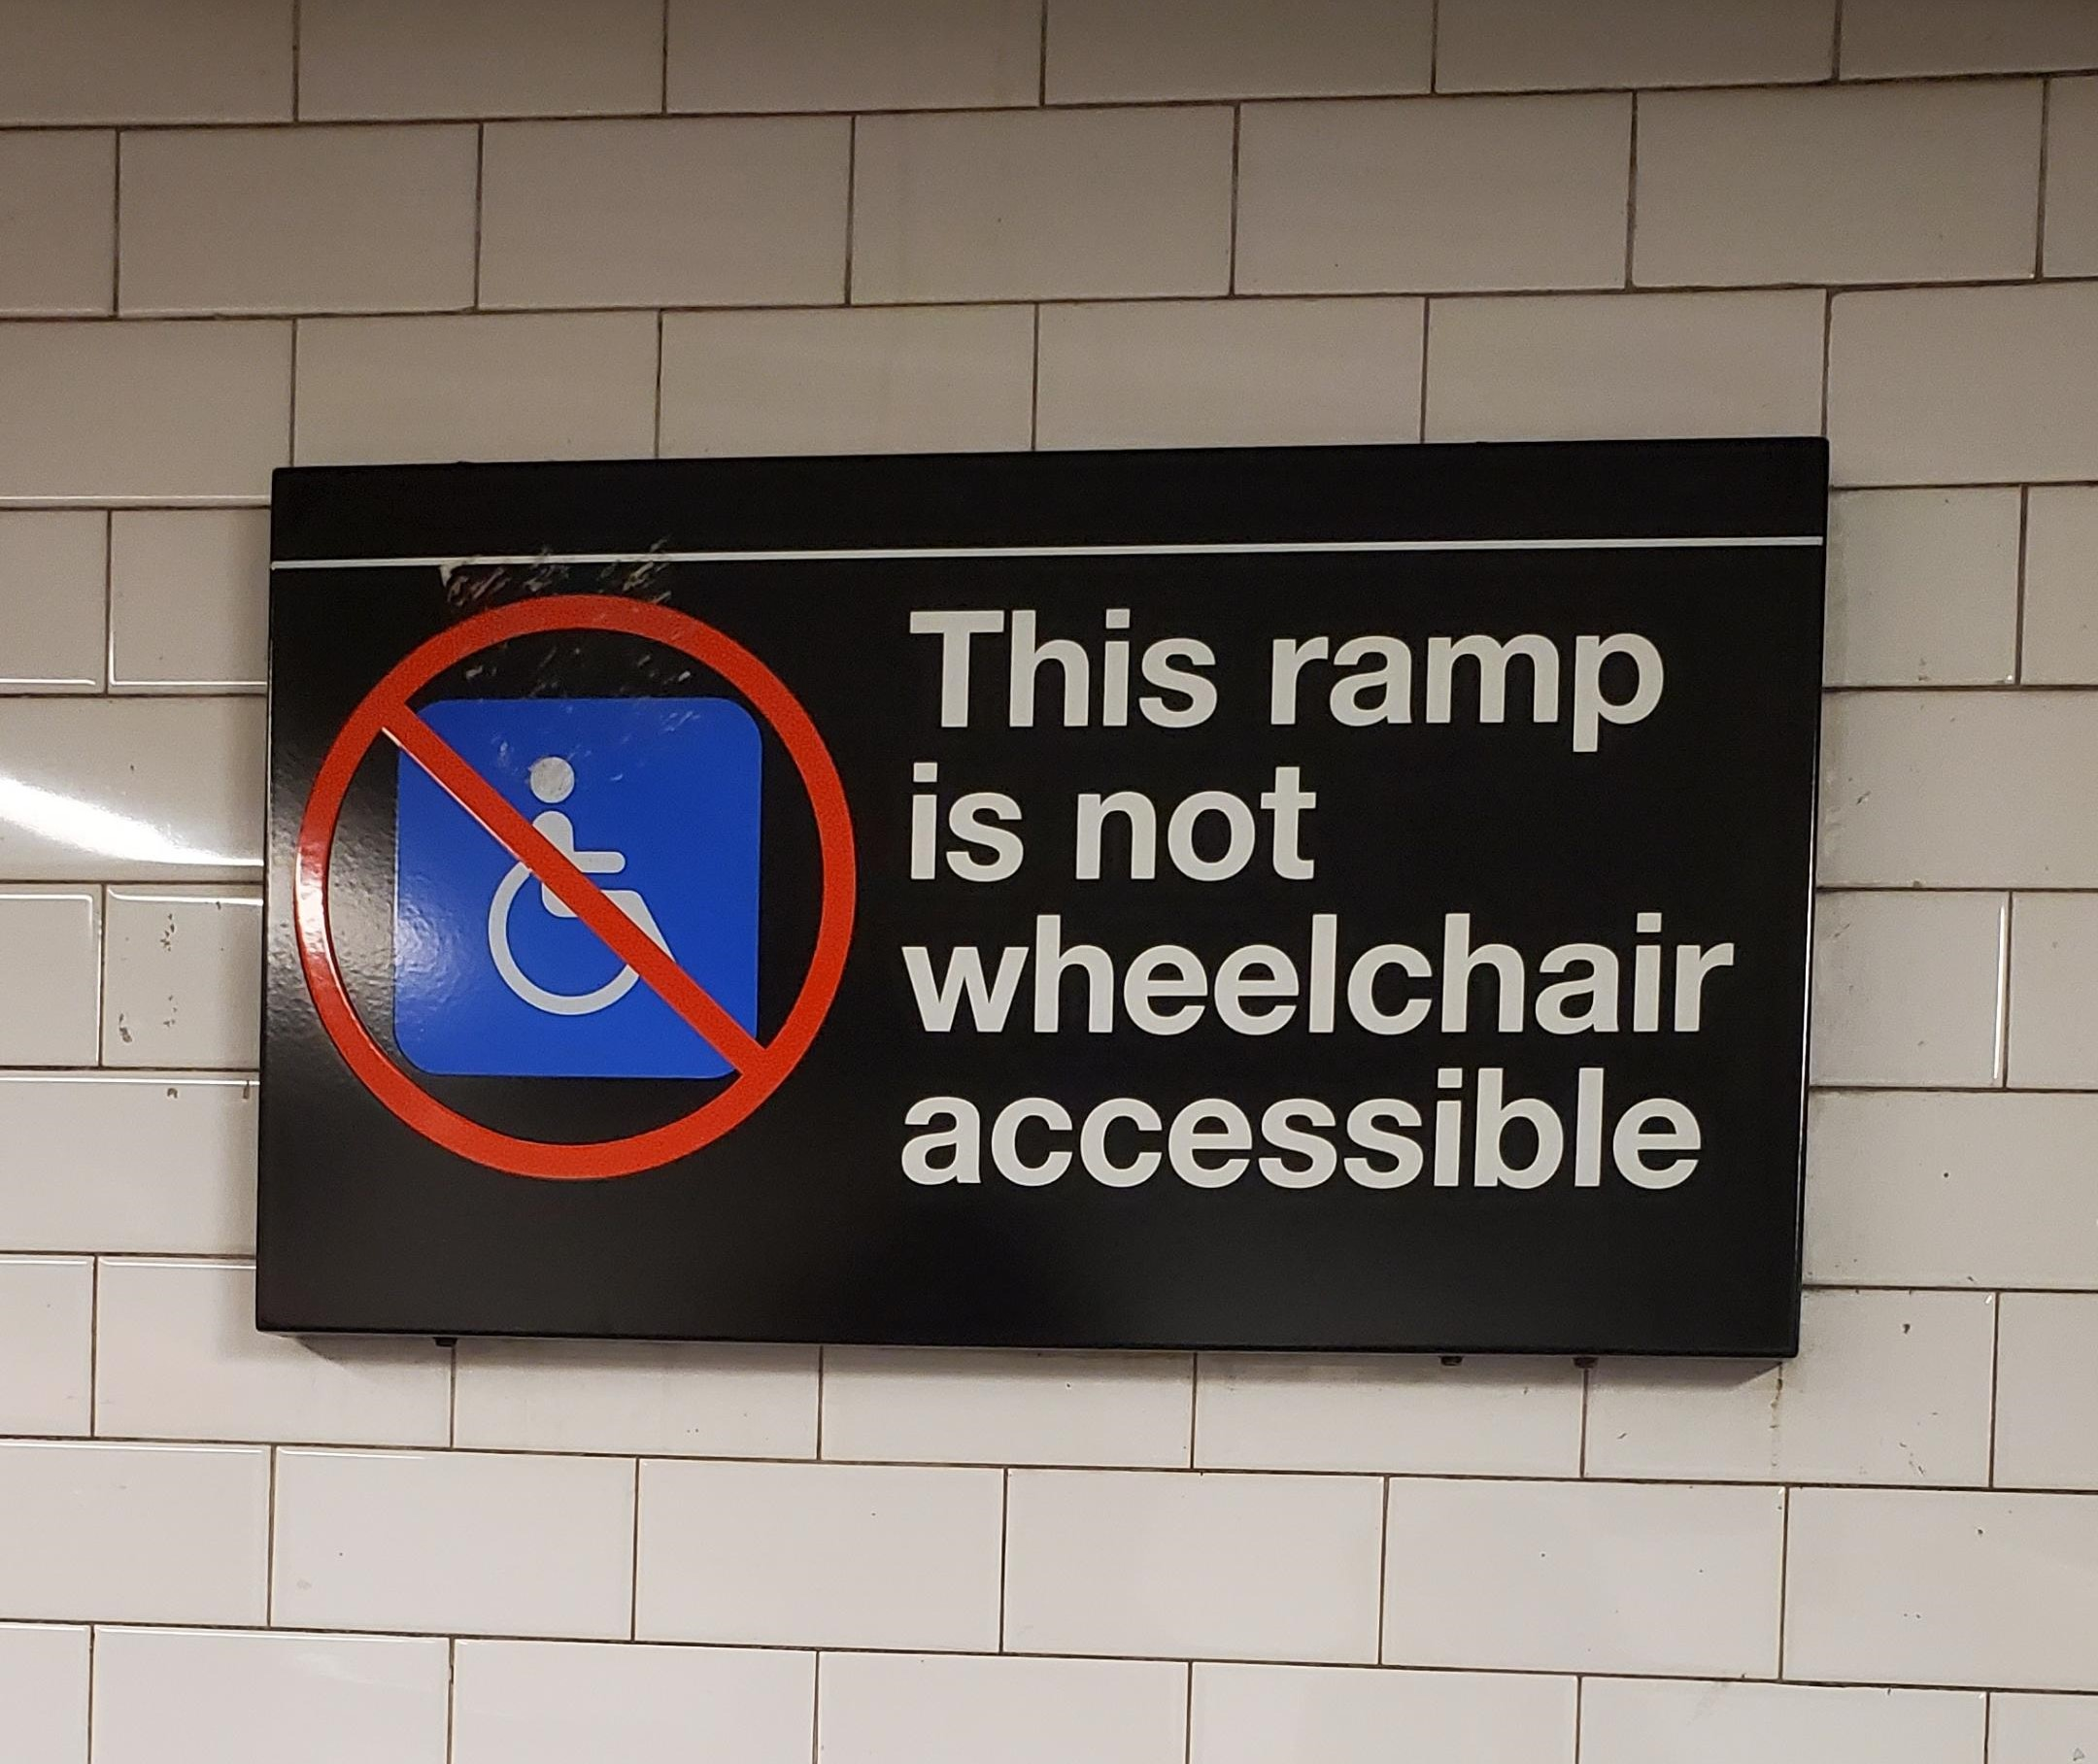 NYC Subway customer experience design fails